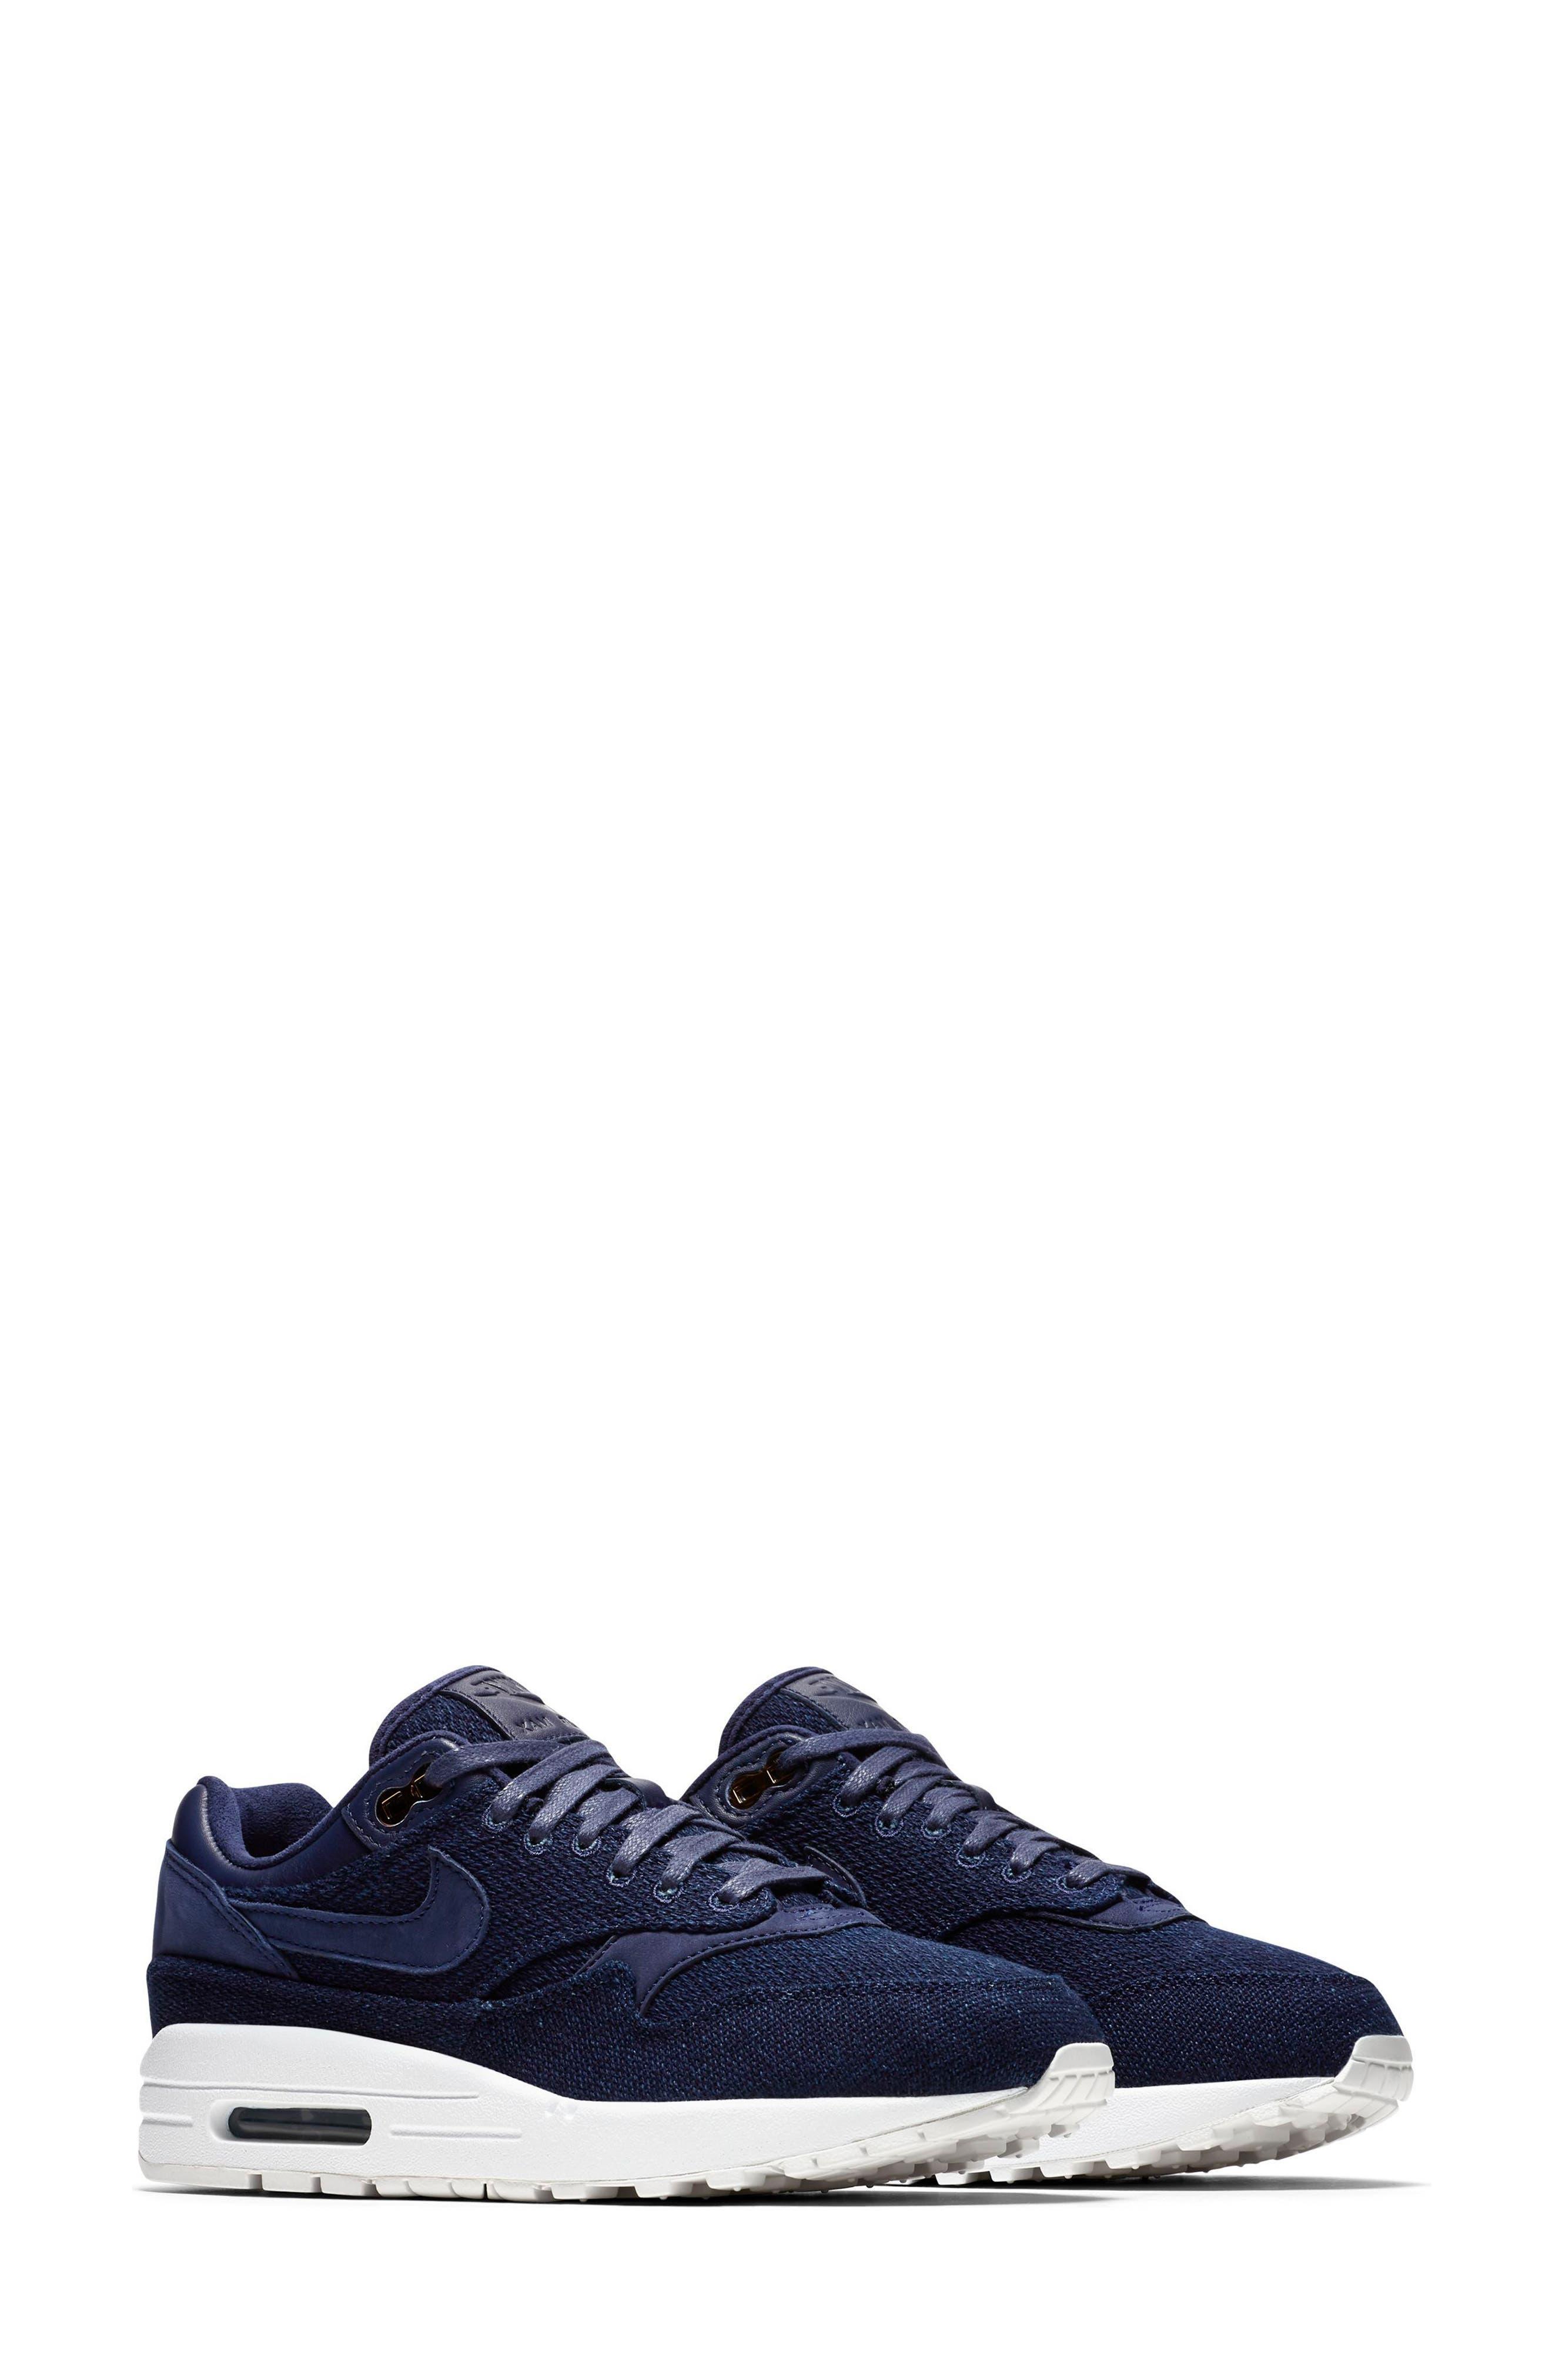 Air Max 1 Lux Sneaker,                             Main thumbnail 1, color,                             Binary Blue/ White/ Stout